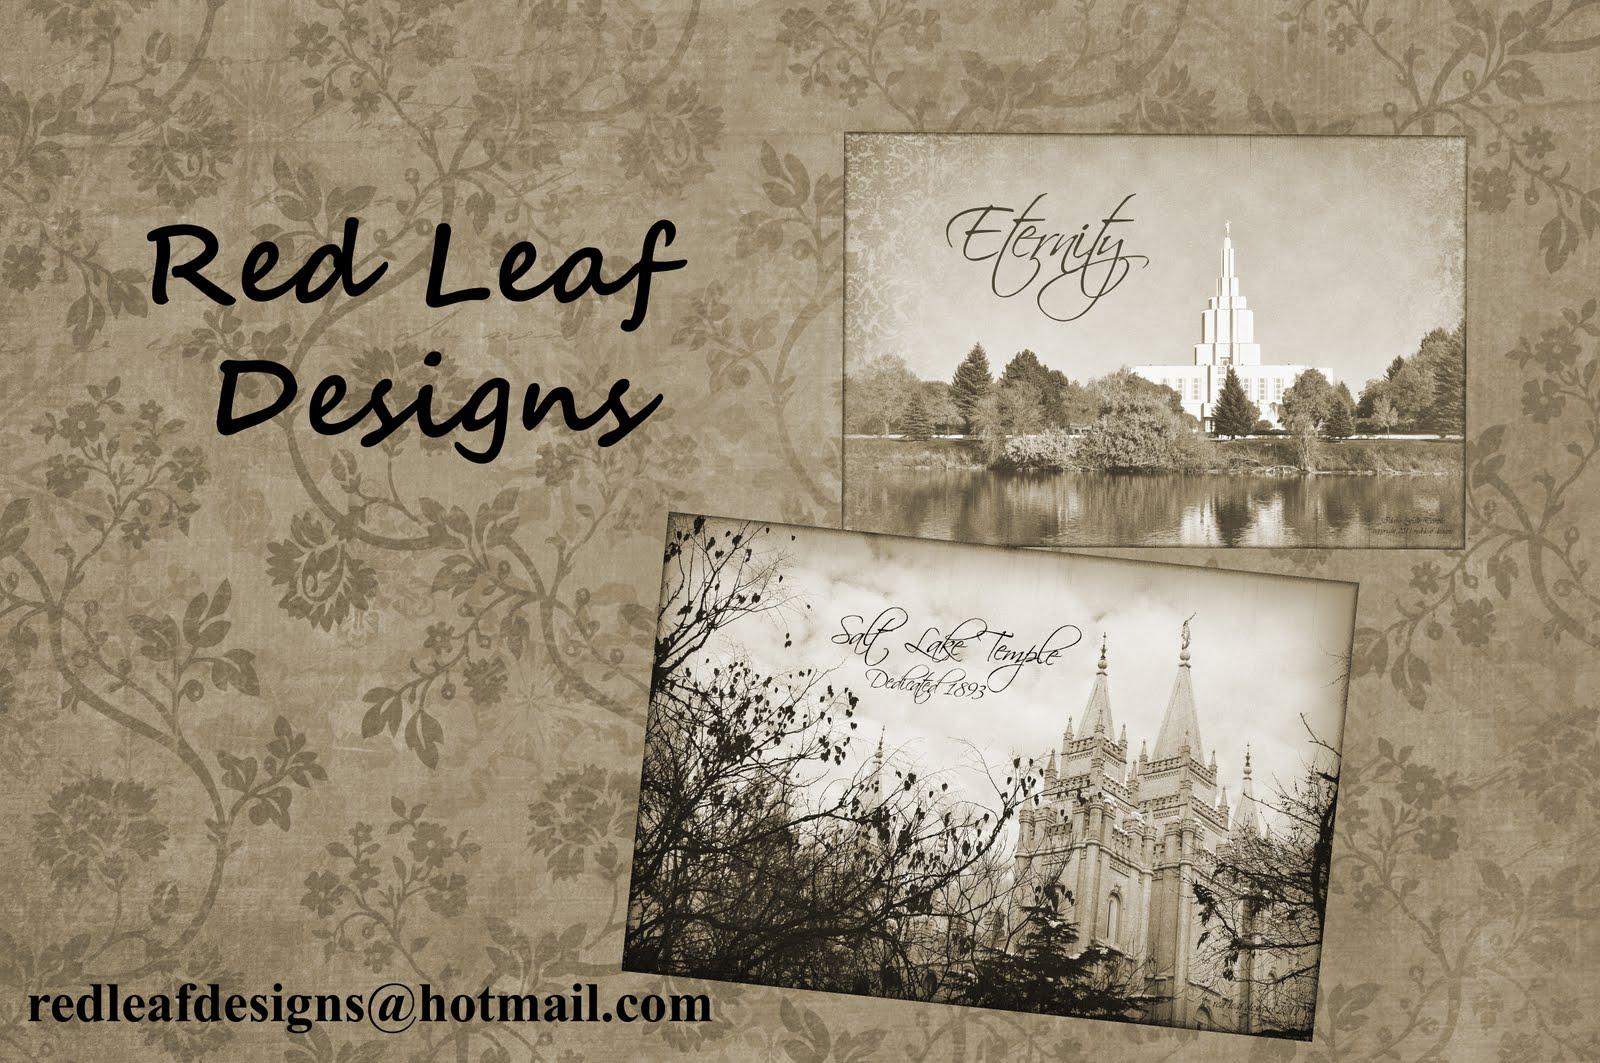 Red Leaf Designs